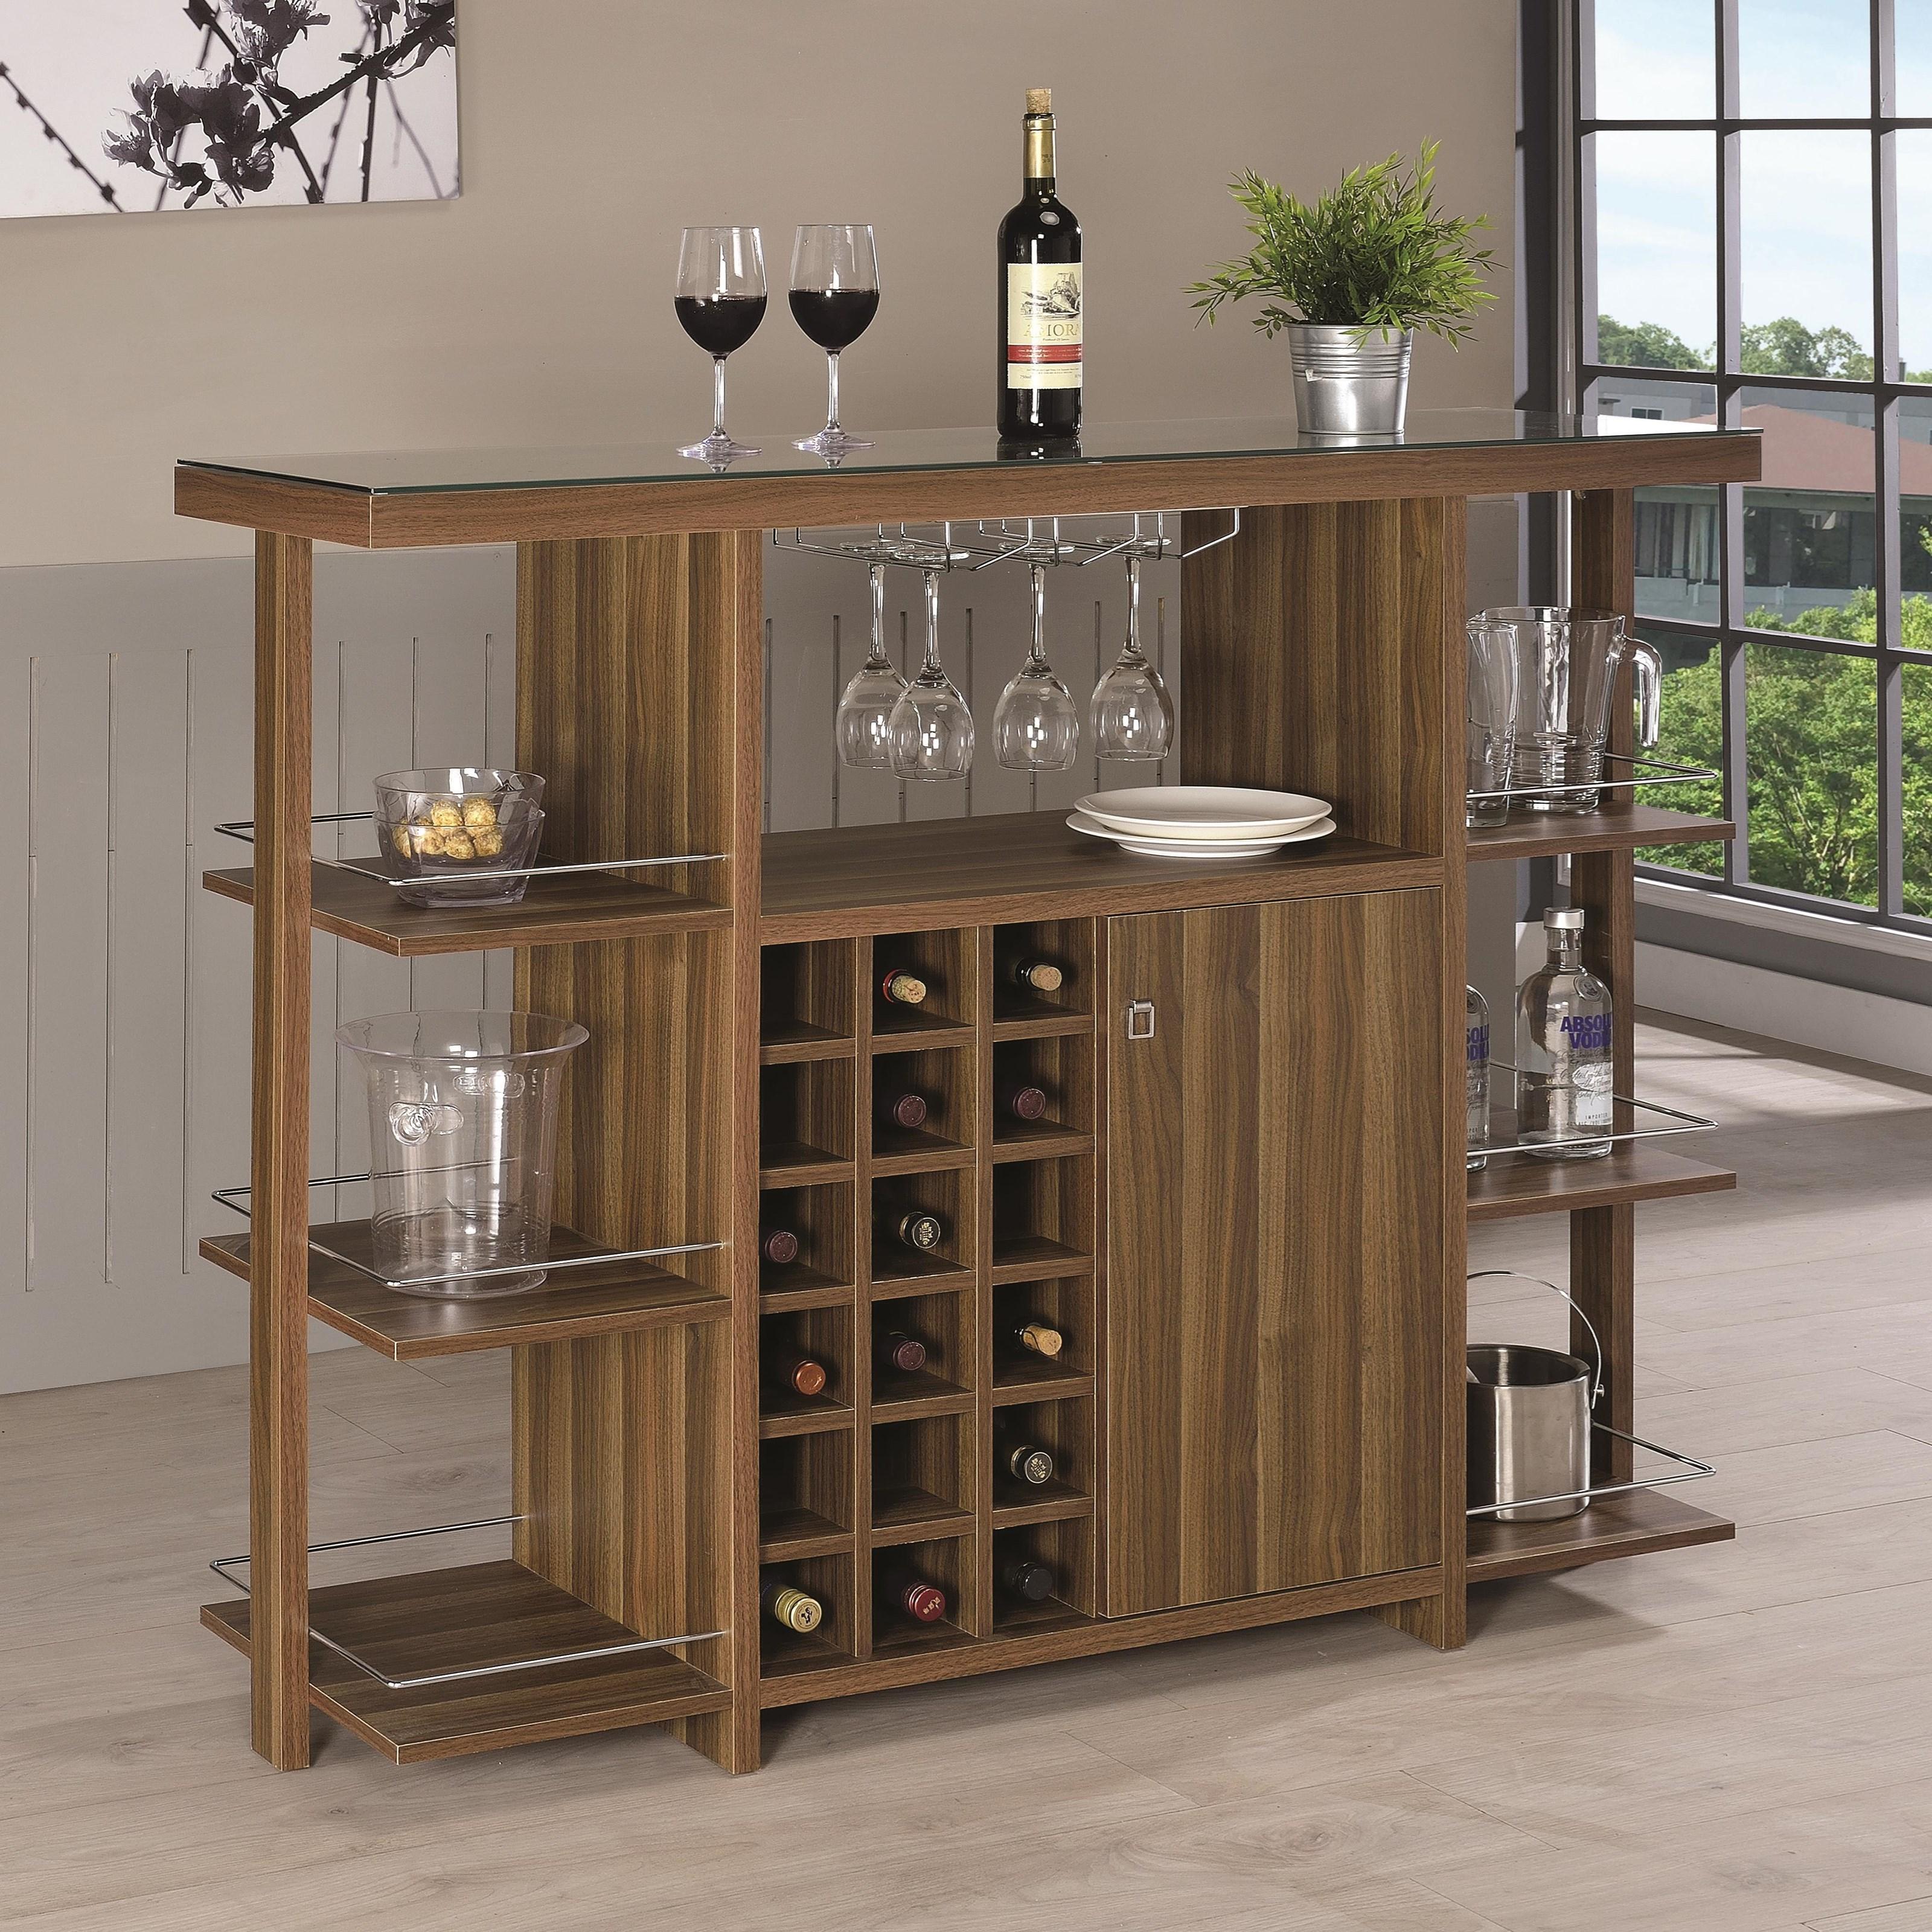 Wine rack bar table Reclaimed Wood Coaster Bar Units And Bar Tablesbar Unit Ebay Delivery Estimates Northeast Factory Direct Cleveland Eastlake